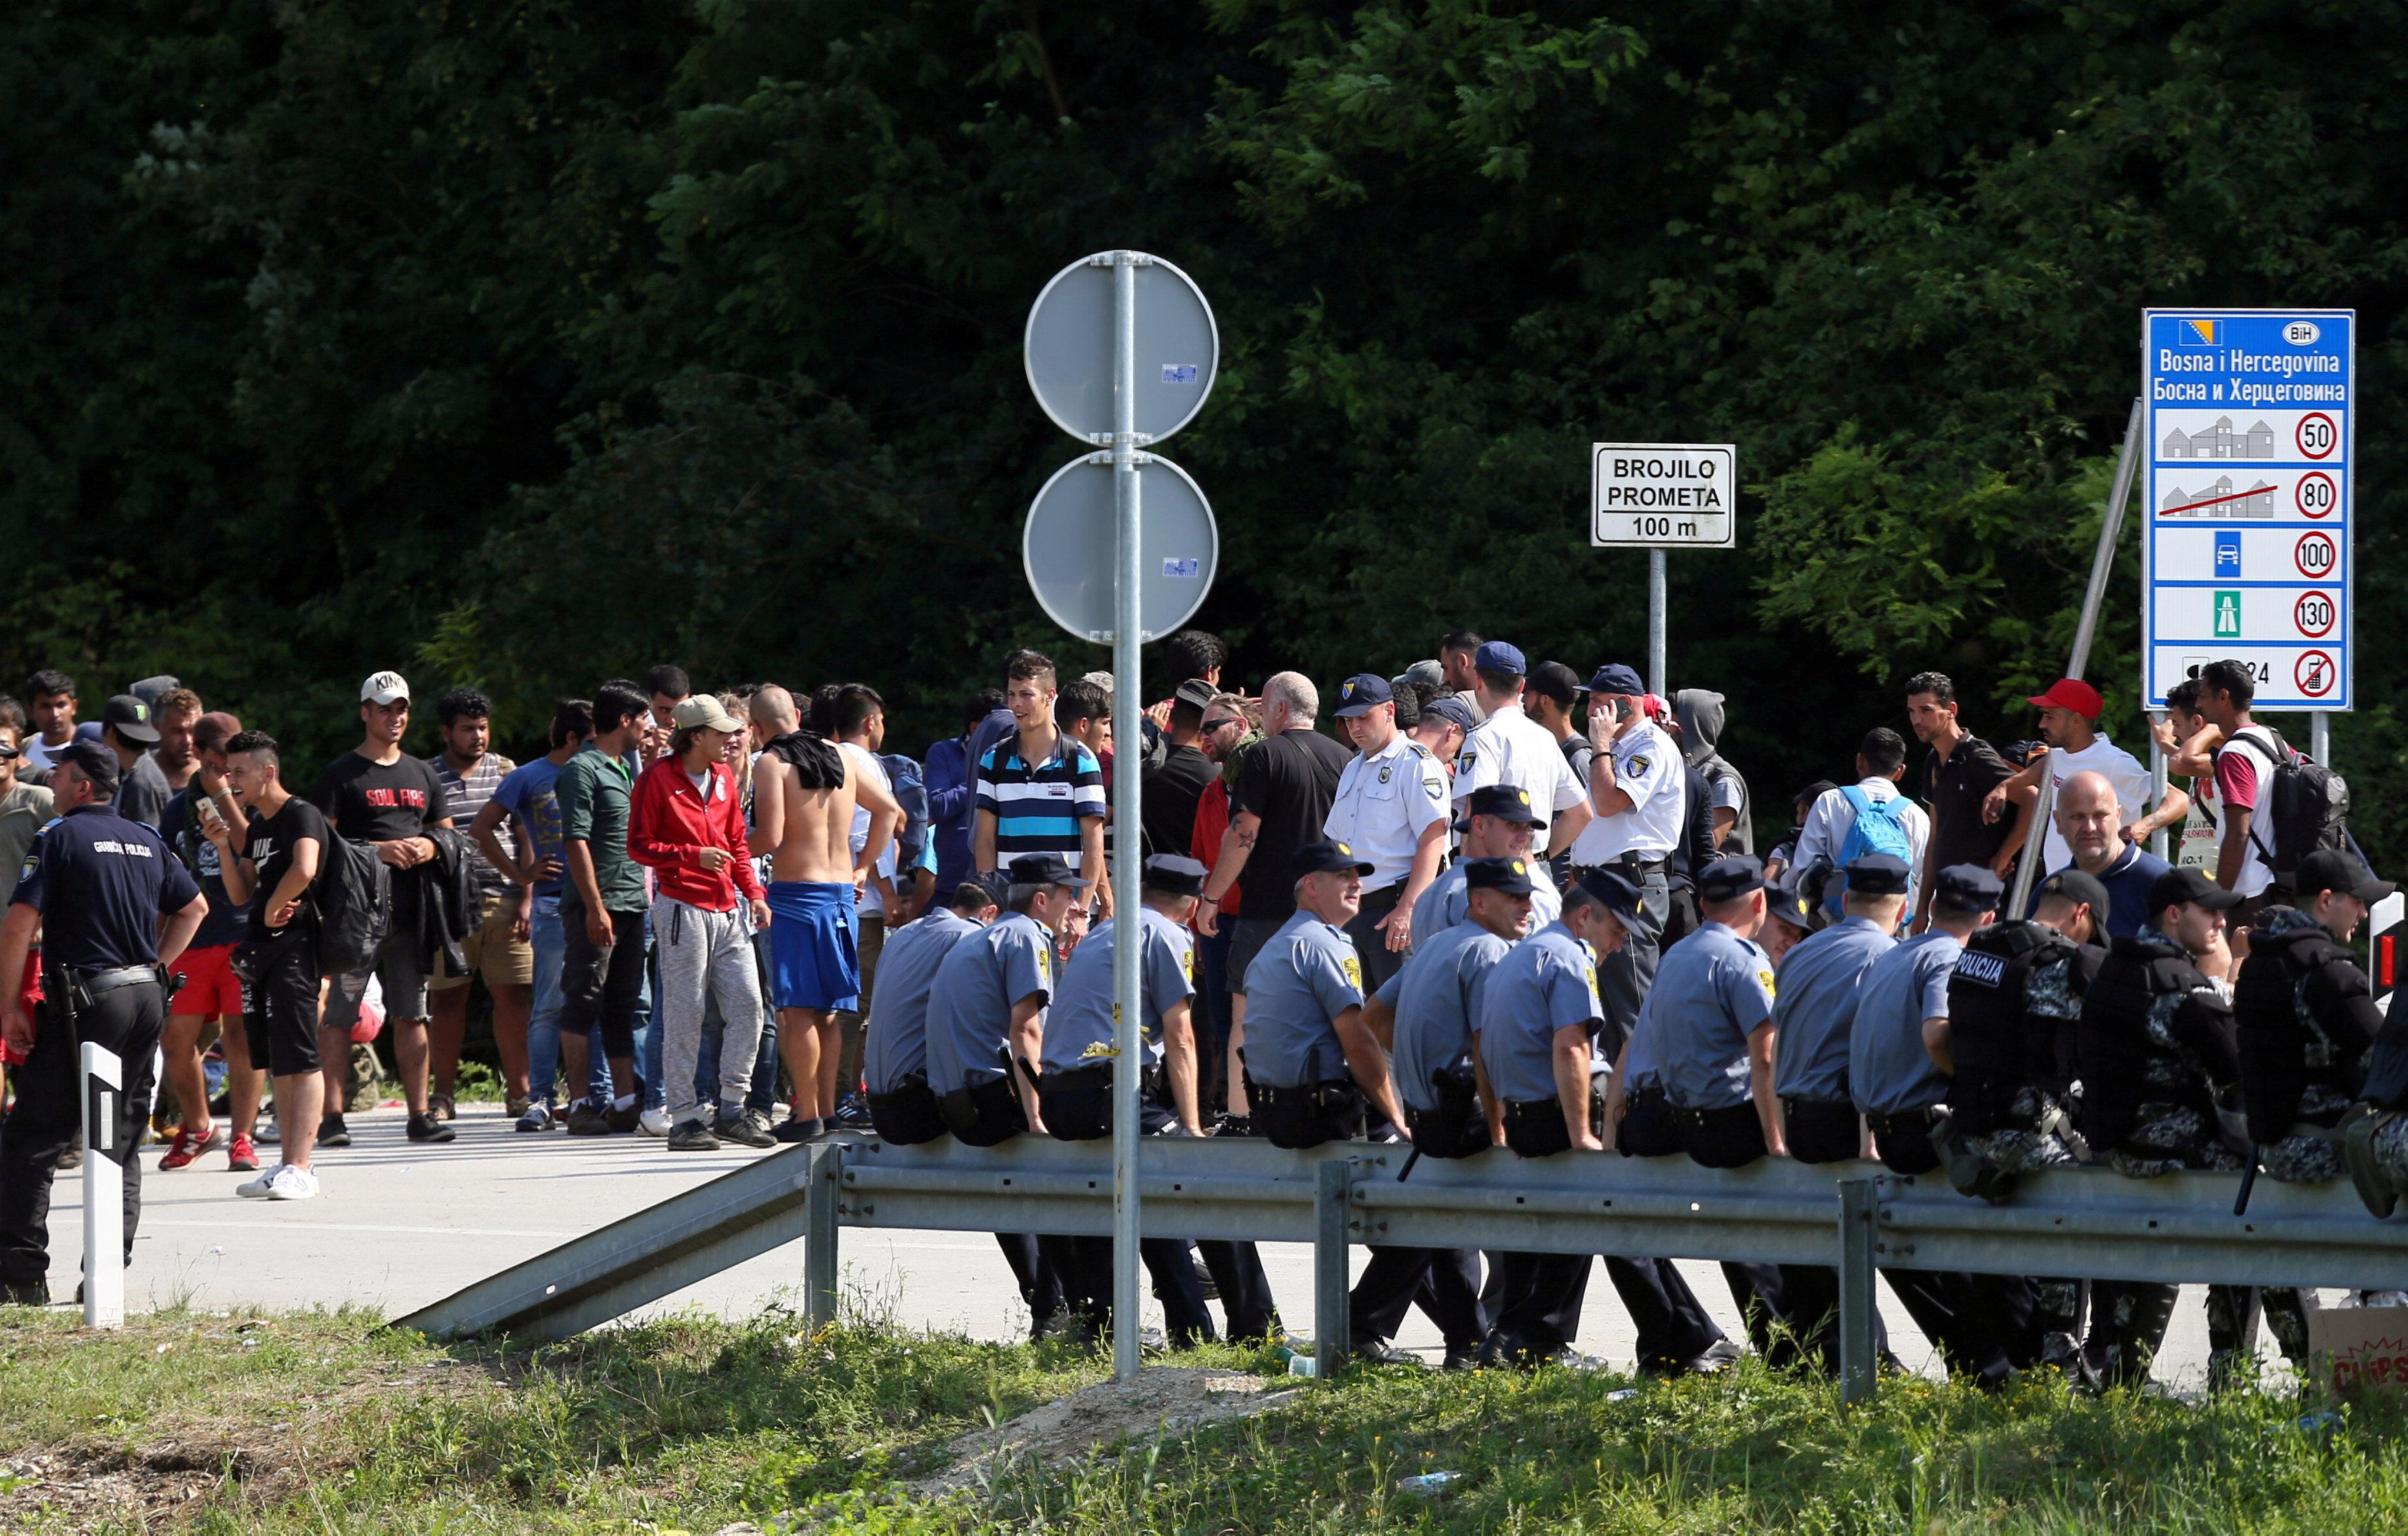 FILE PHOTO: Migrants and Bosnian police eye one another in Velika Kladusa, Bosnia, near the border with Croatia